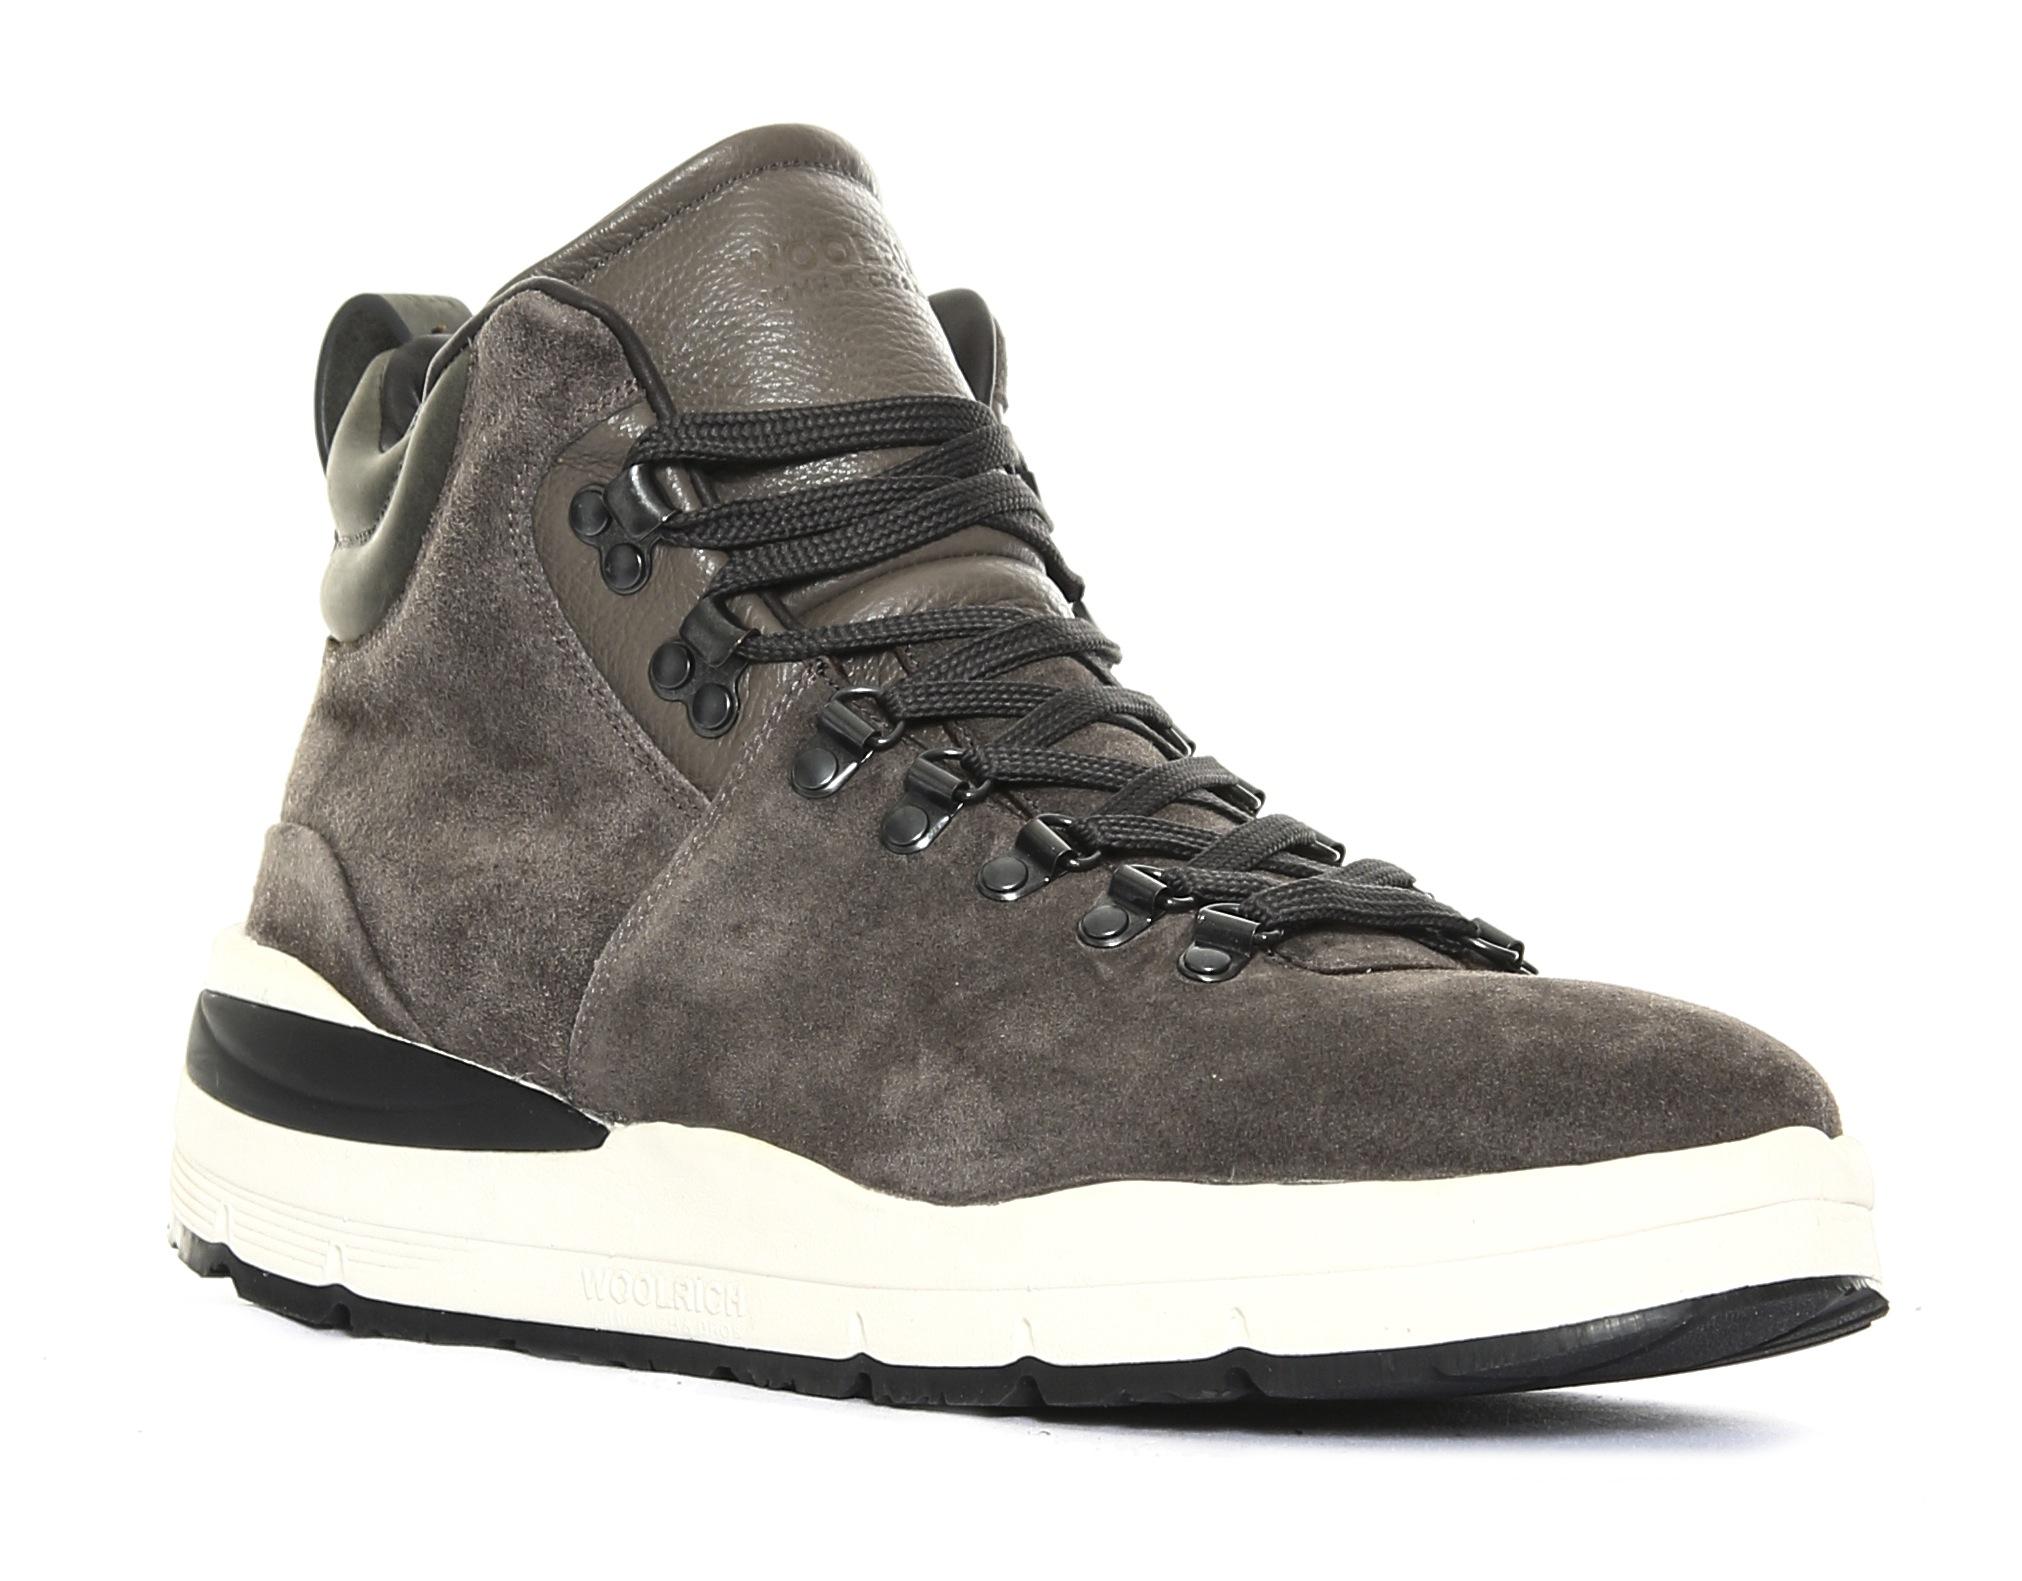 Pitti Uomo Woolrich Presenta Nuovo Progetto Footwear